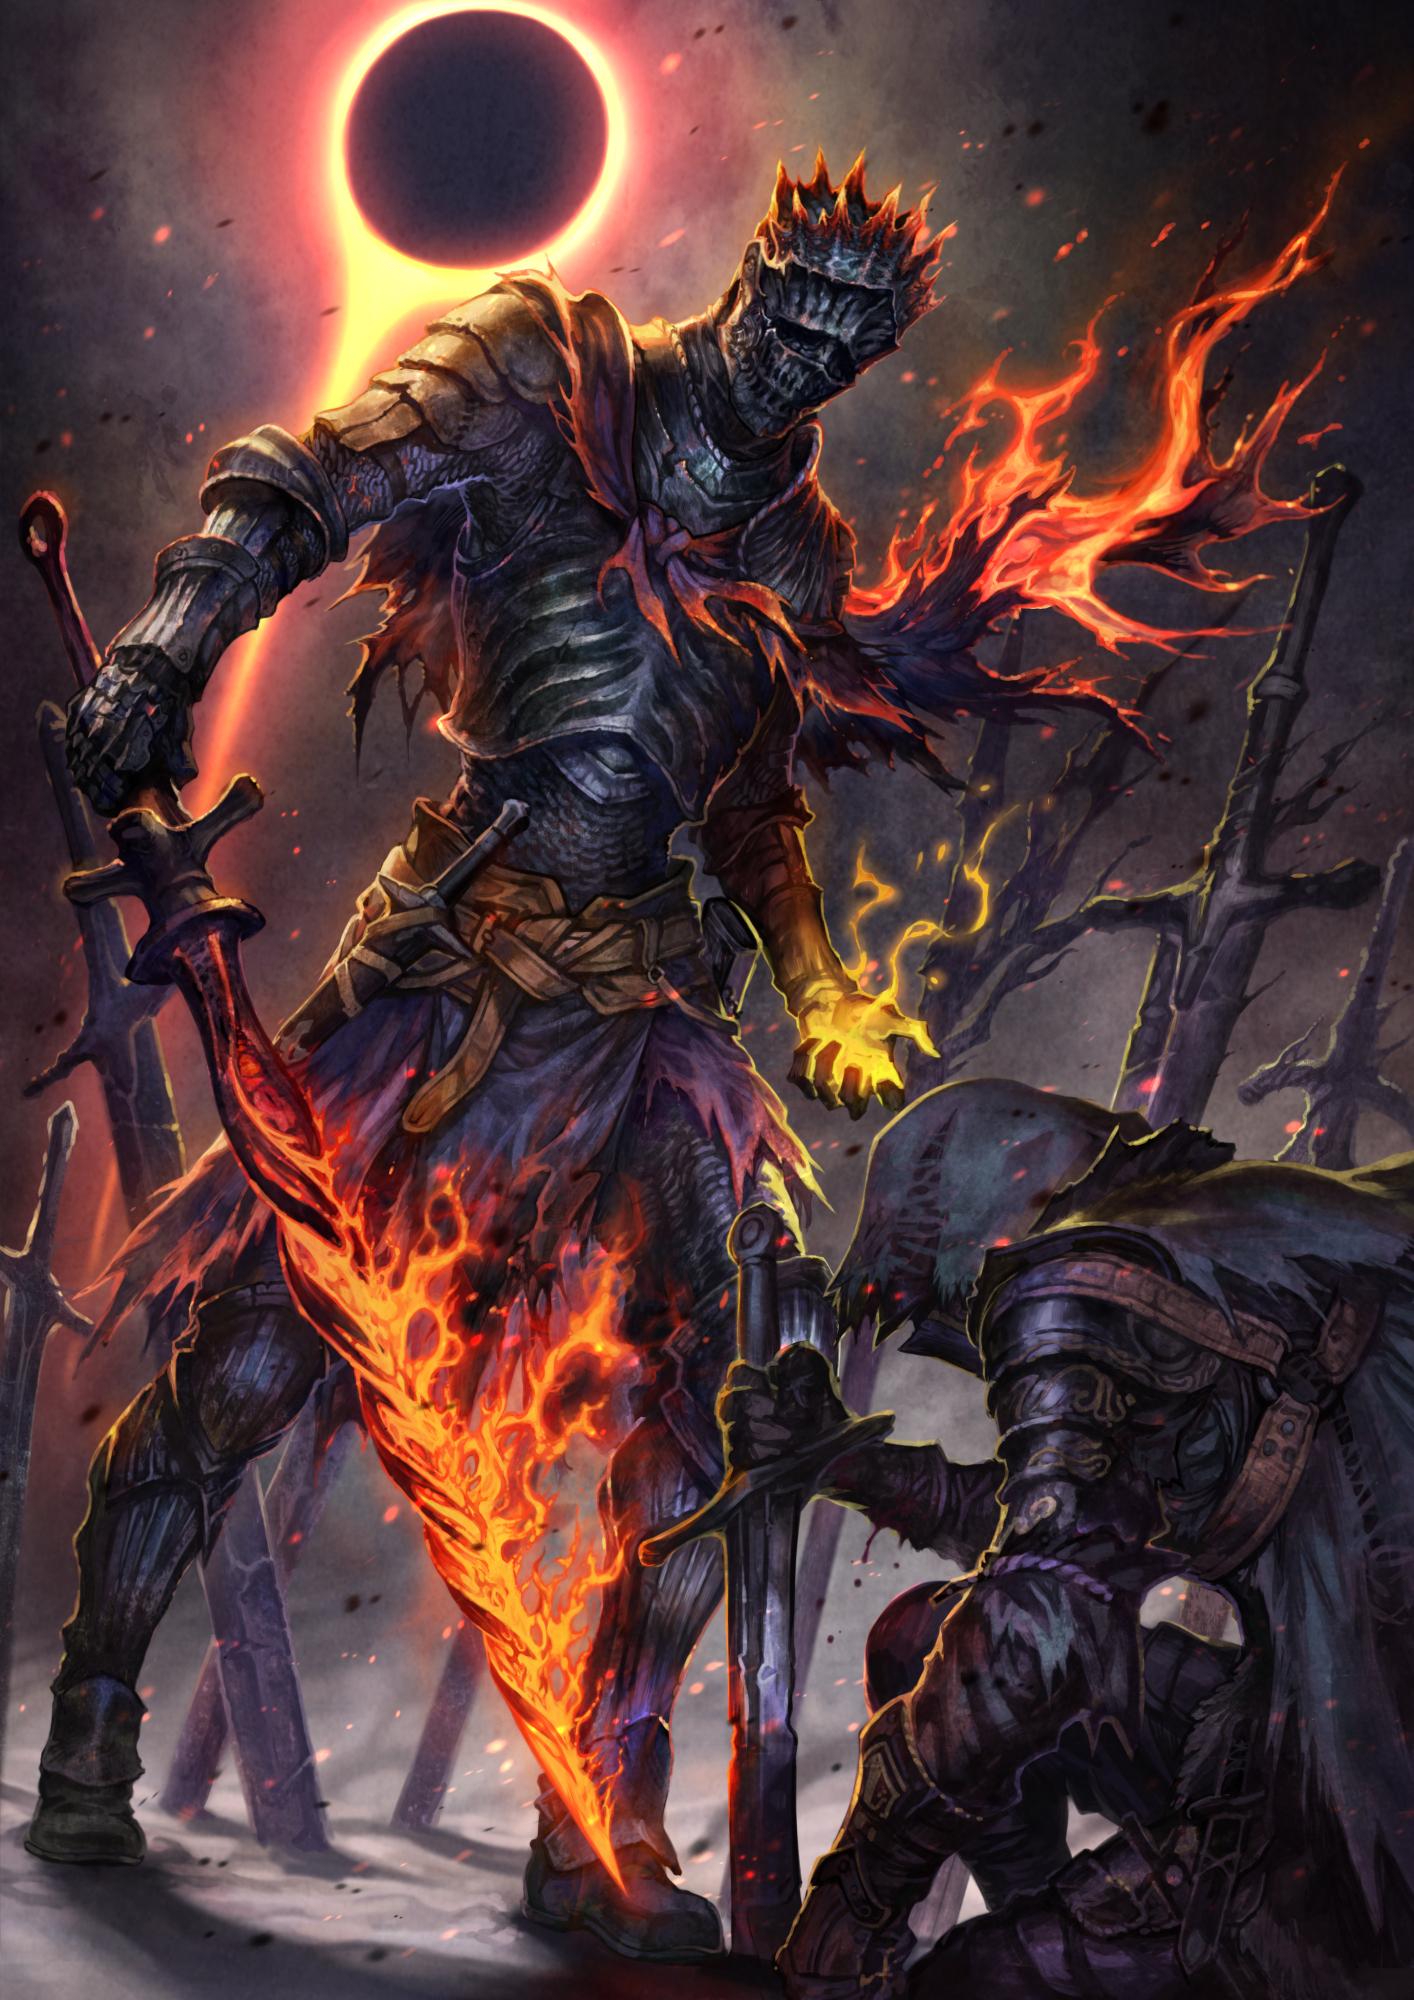 Wallpaper Dark Souls Iii Soul Of Cinder Hd Games 1670 Hd